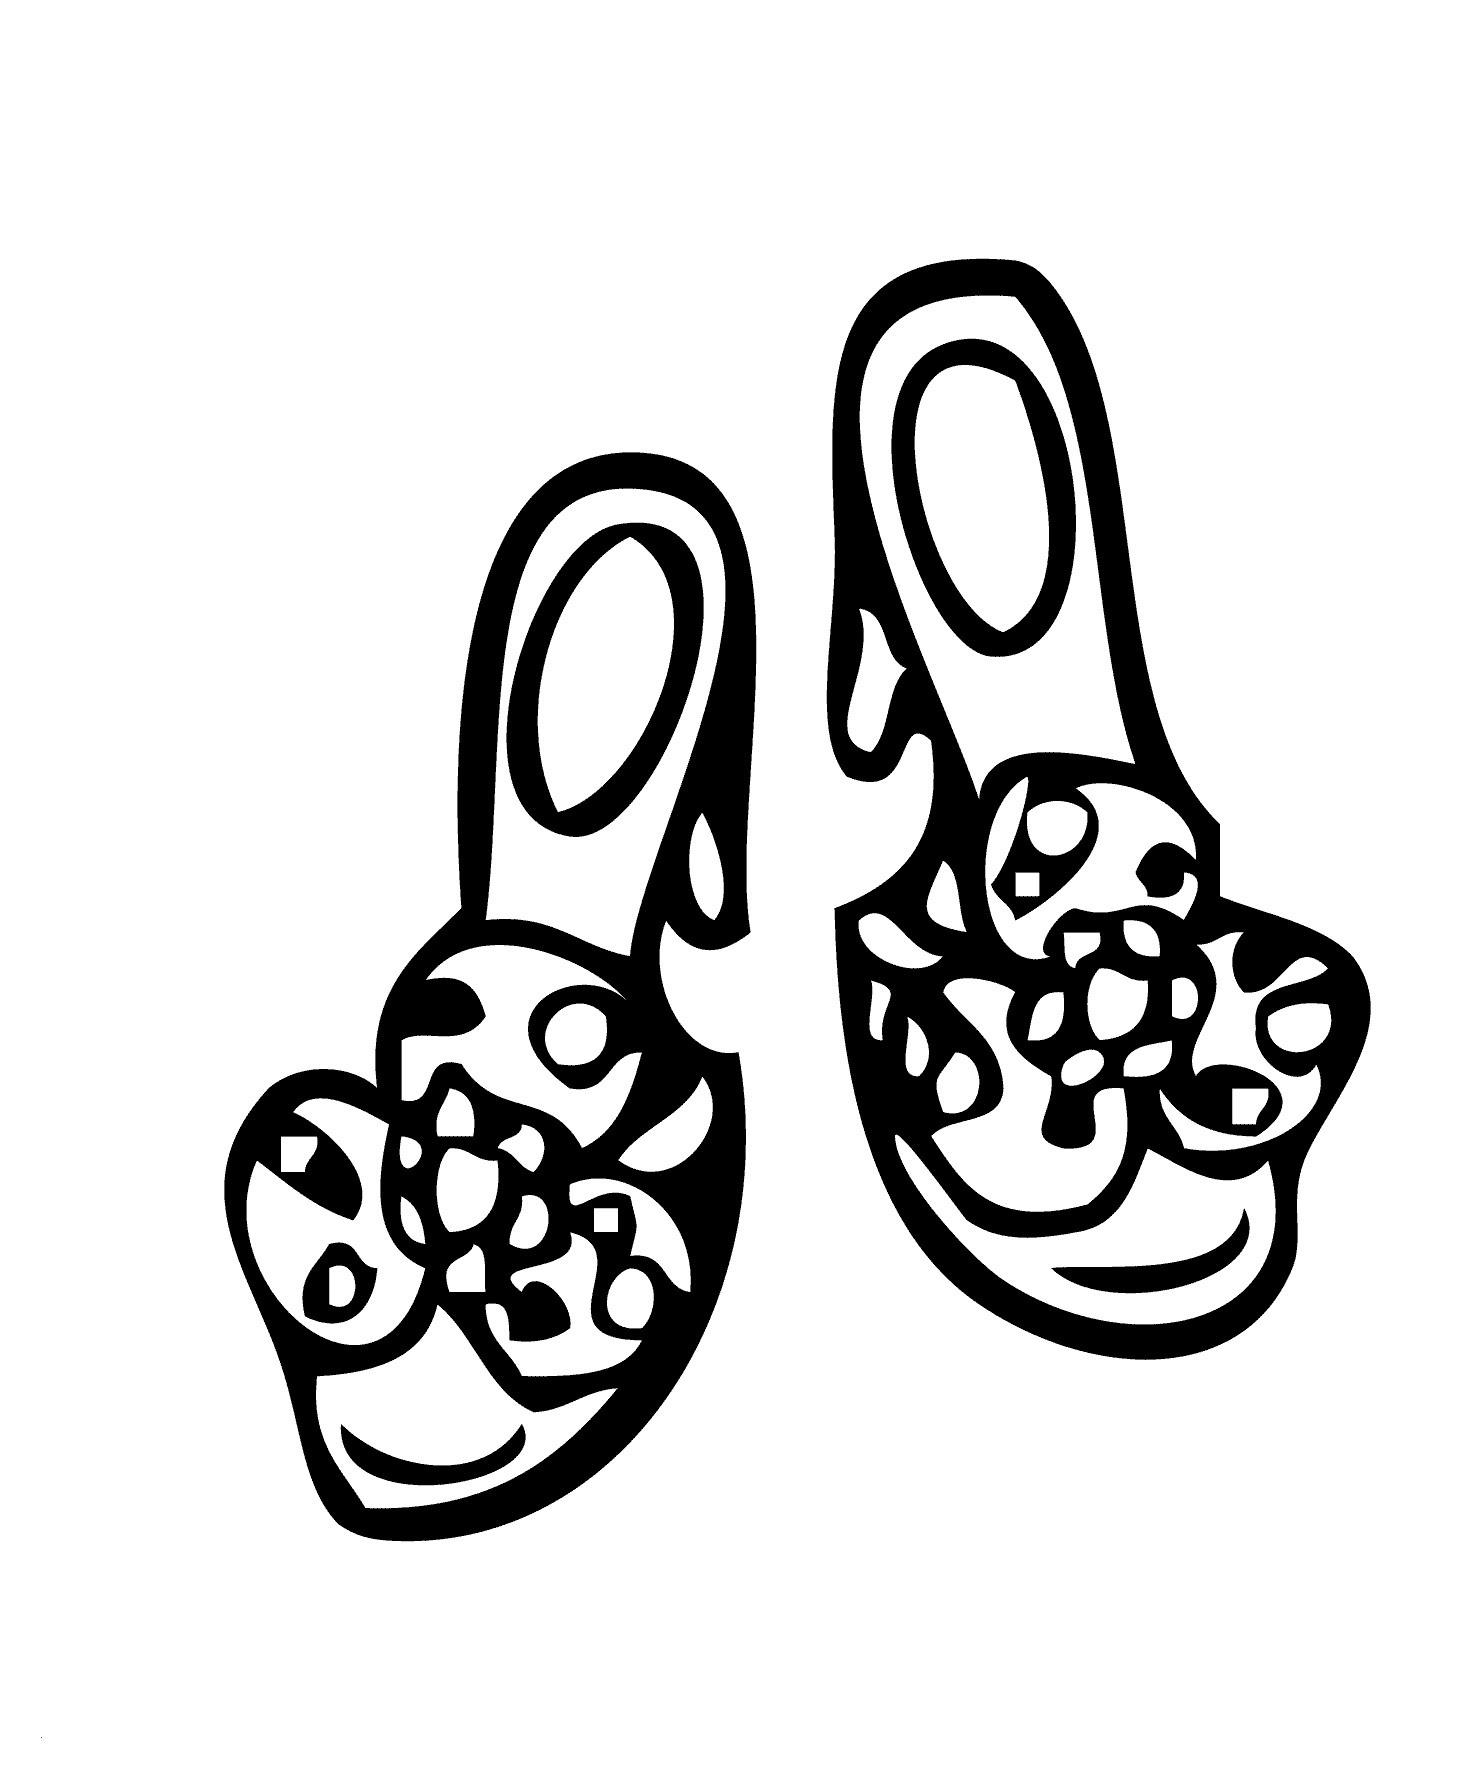 Essen Zum Ausmalen Inspirierend Girls Shoes Coloring Page Printable Free for Girls Inspirierend Fotografieren